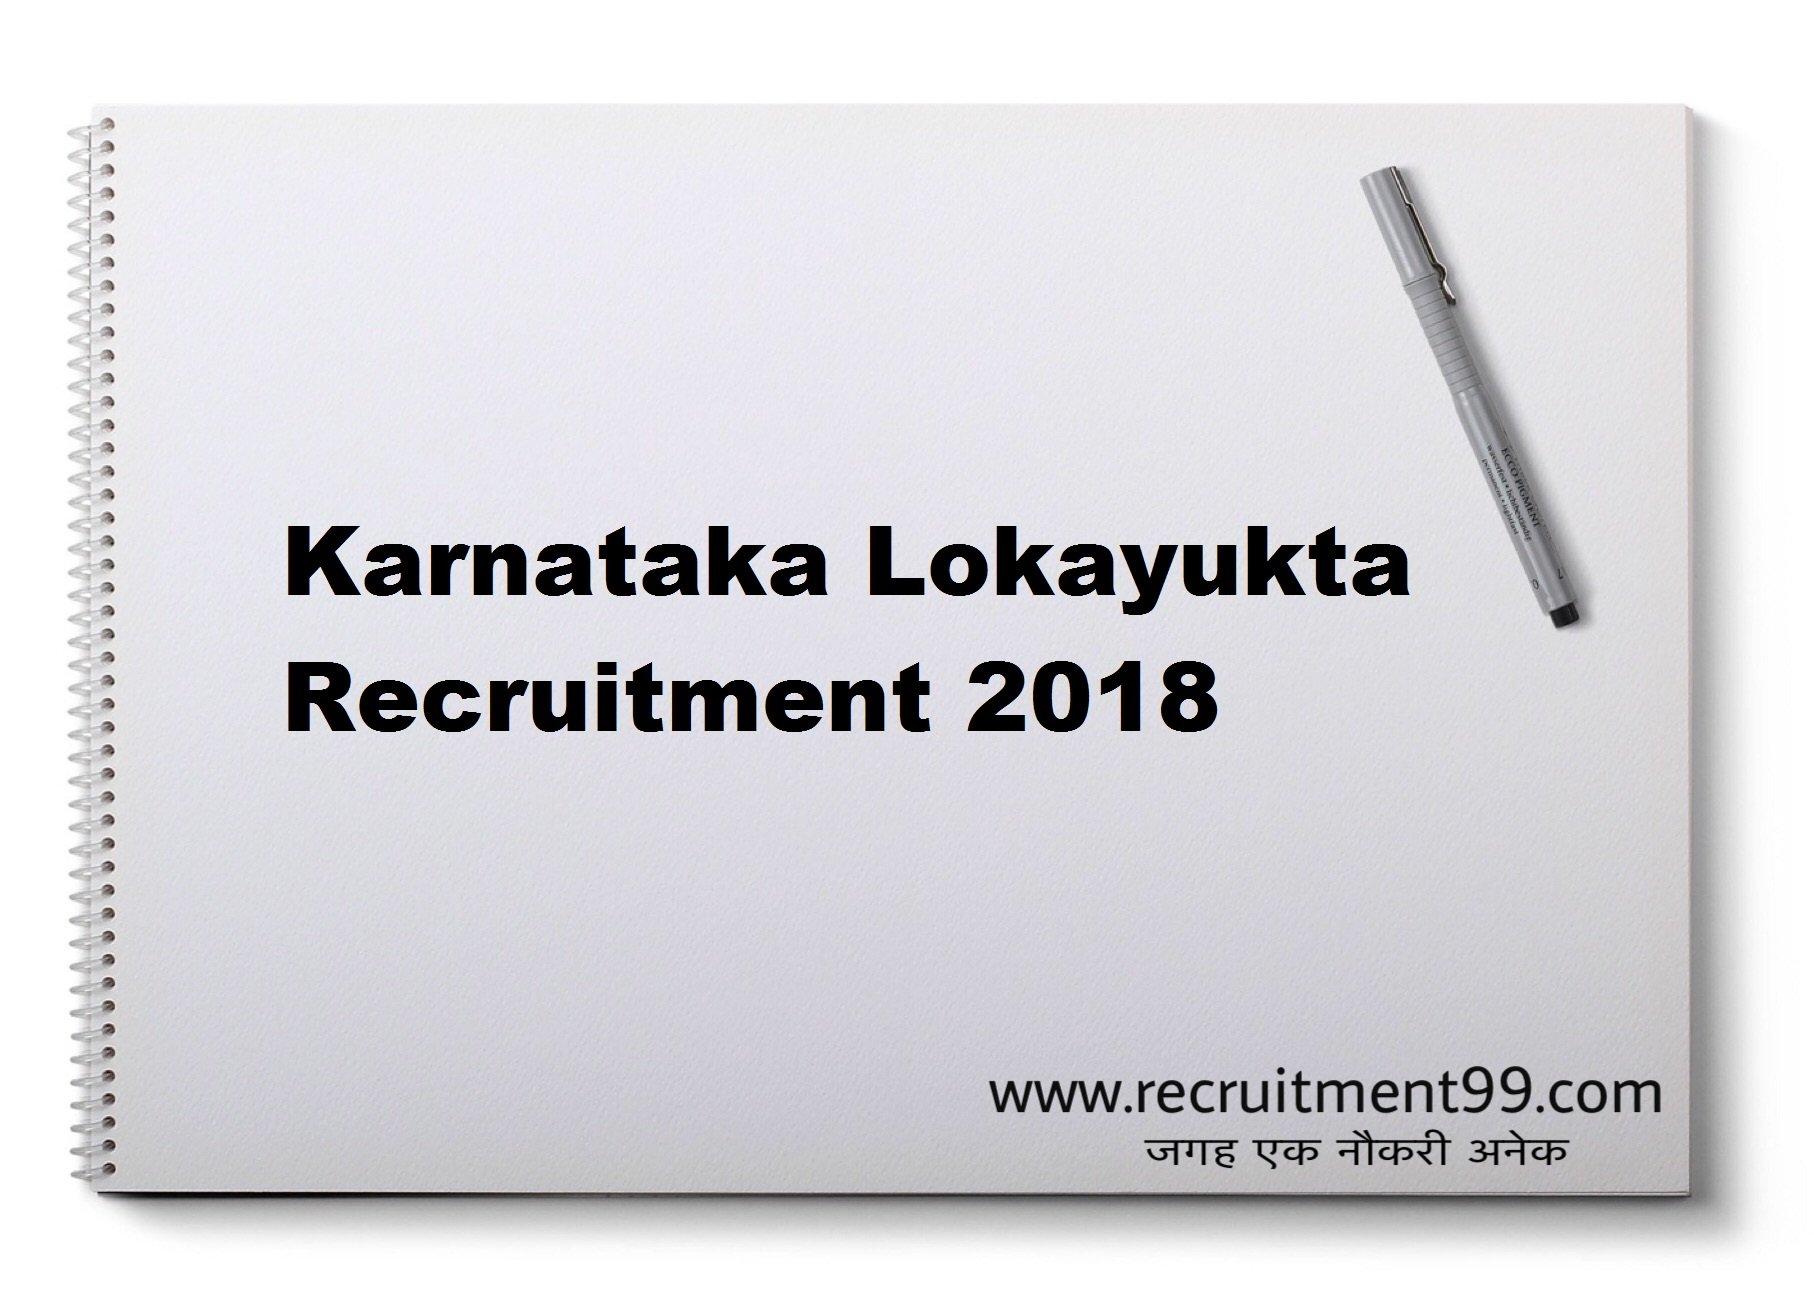 Karnataka Lokayukta Clerk Steno Typist Dayalat Recruitment Admit Card Result 2018